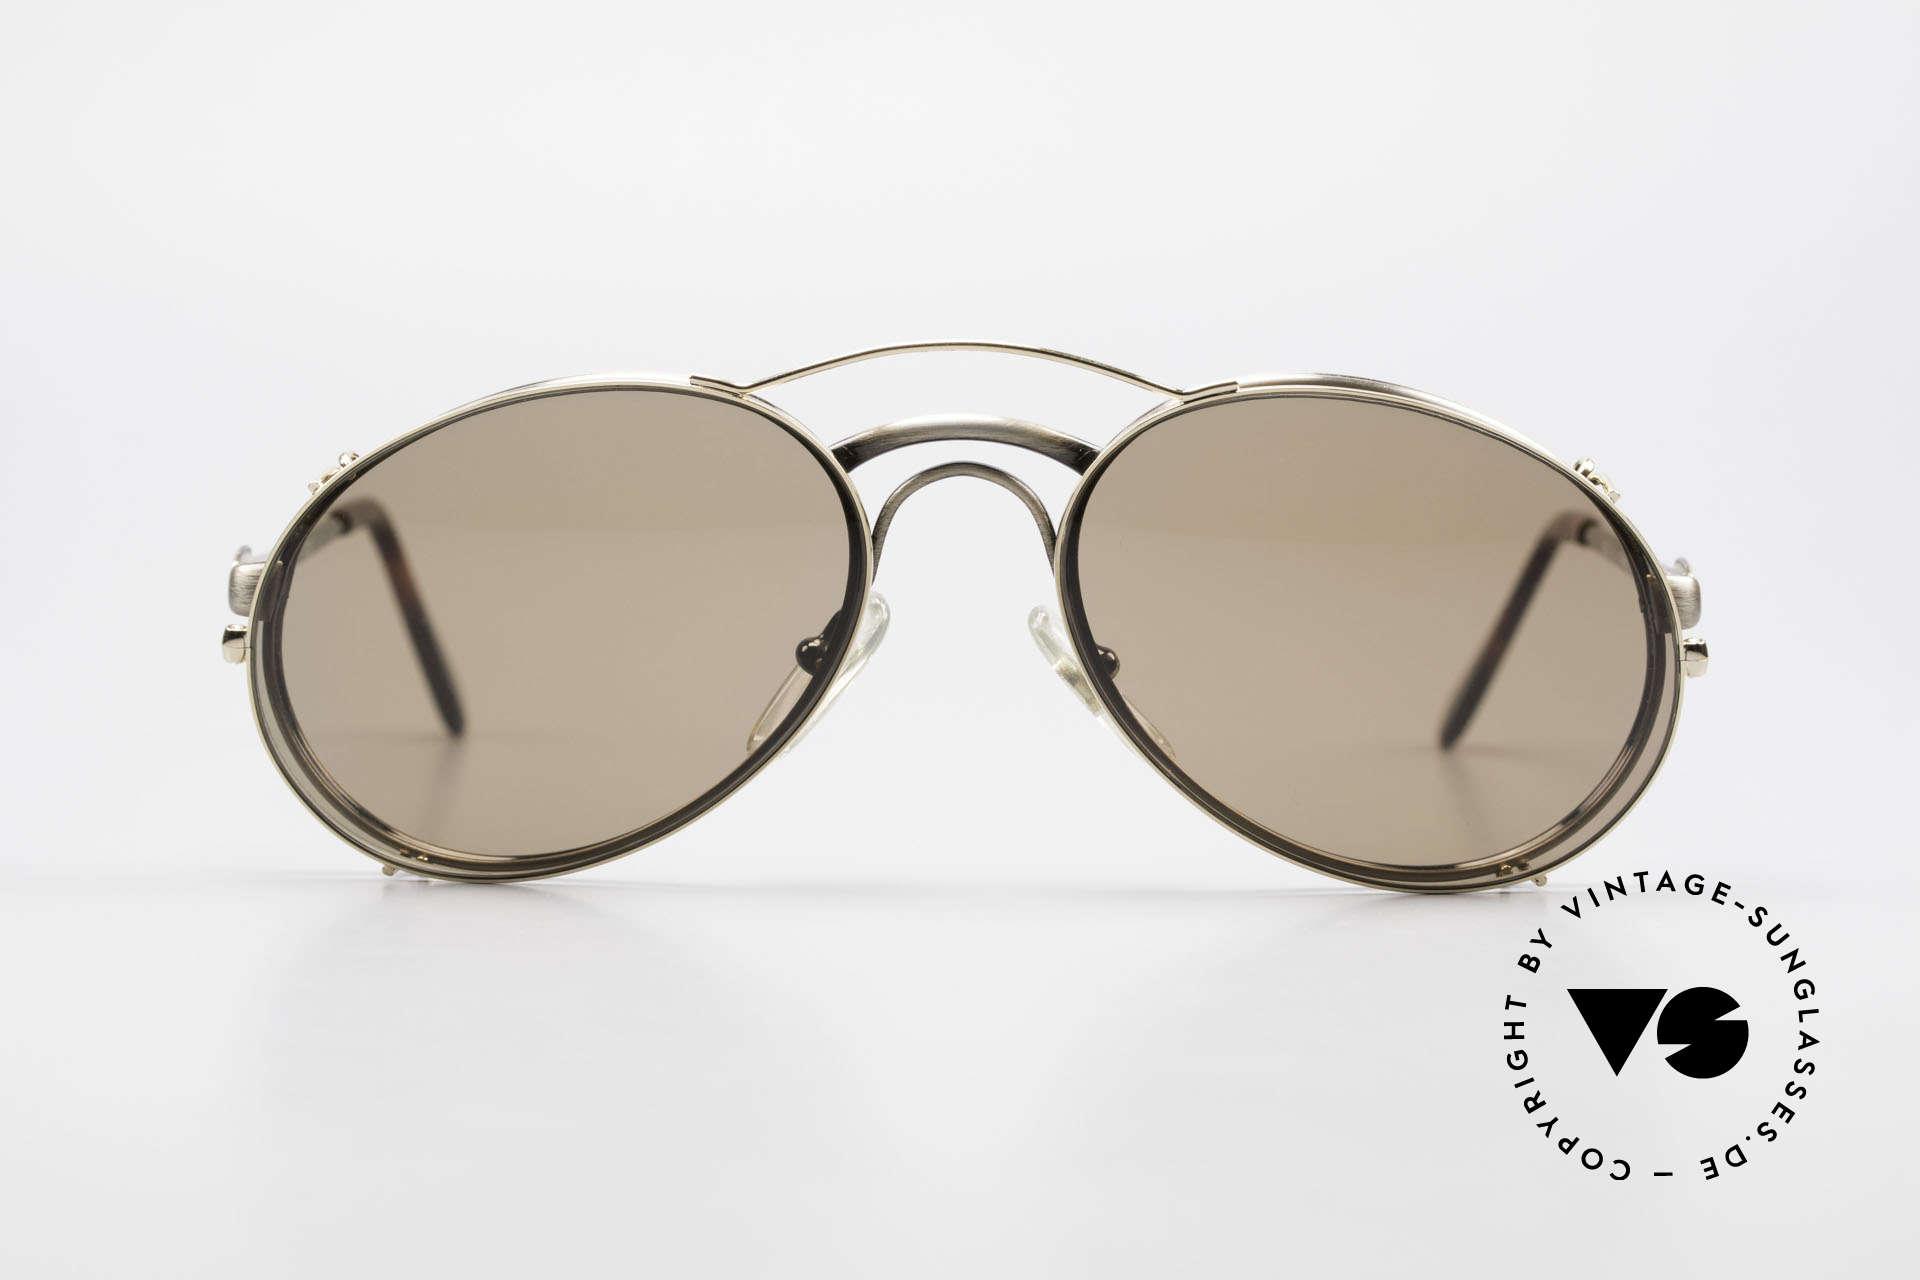 Bugatti 03323 Men's 80's Frame With Clip On, distinctive Bugatti 'tear drop' shape; in 50mm size, Made for Men